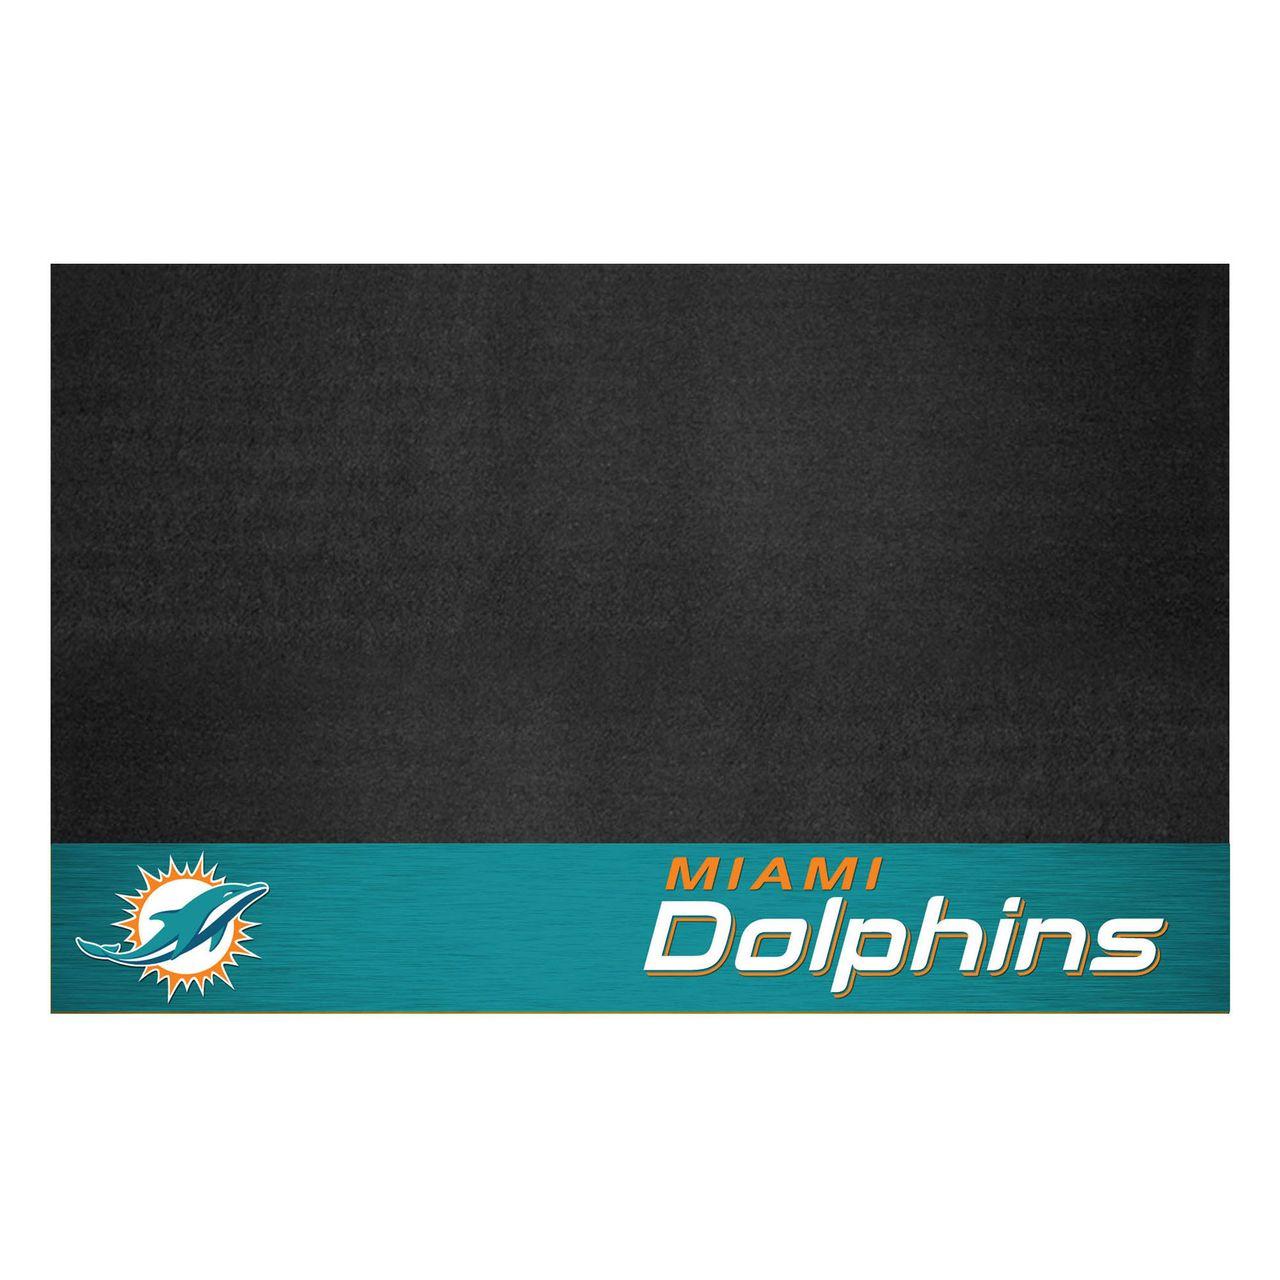 "NFL - Miami Dolphins Grill Mat 26"" x 42"""